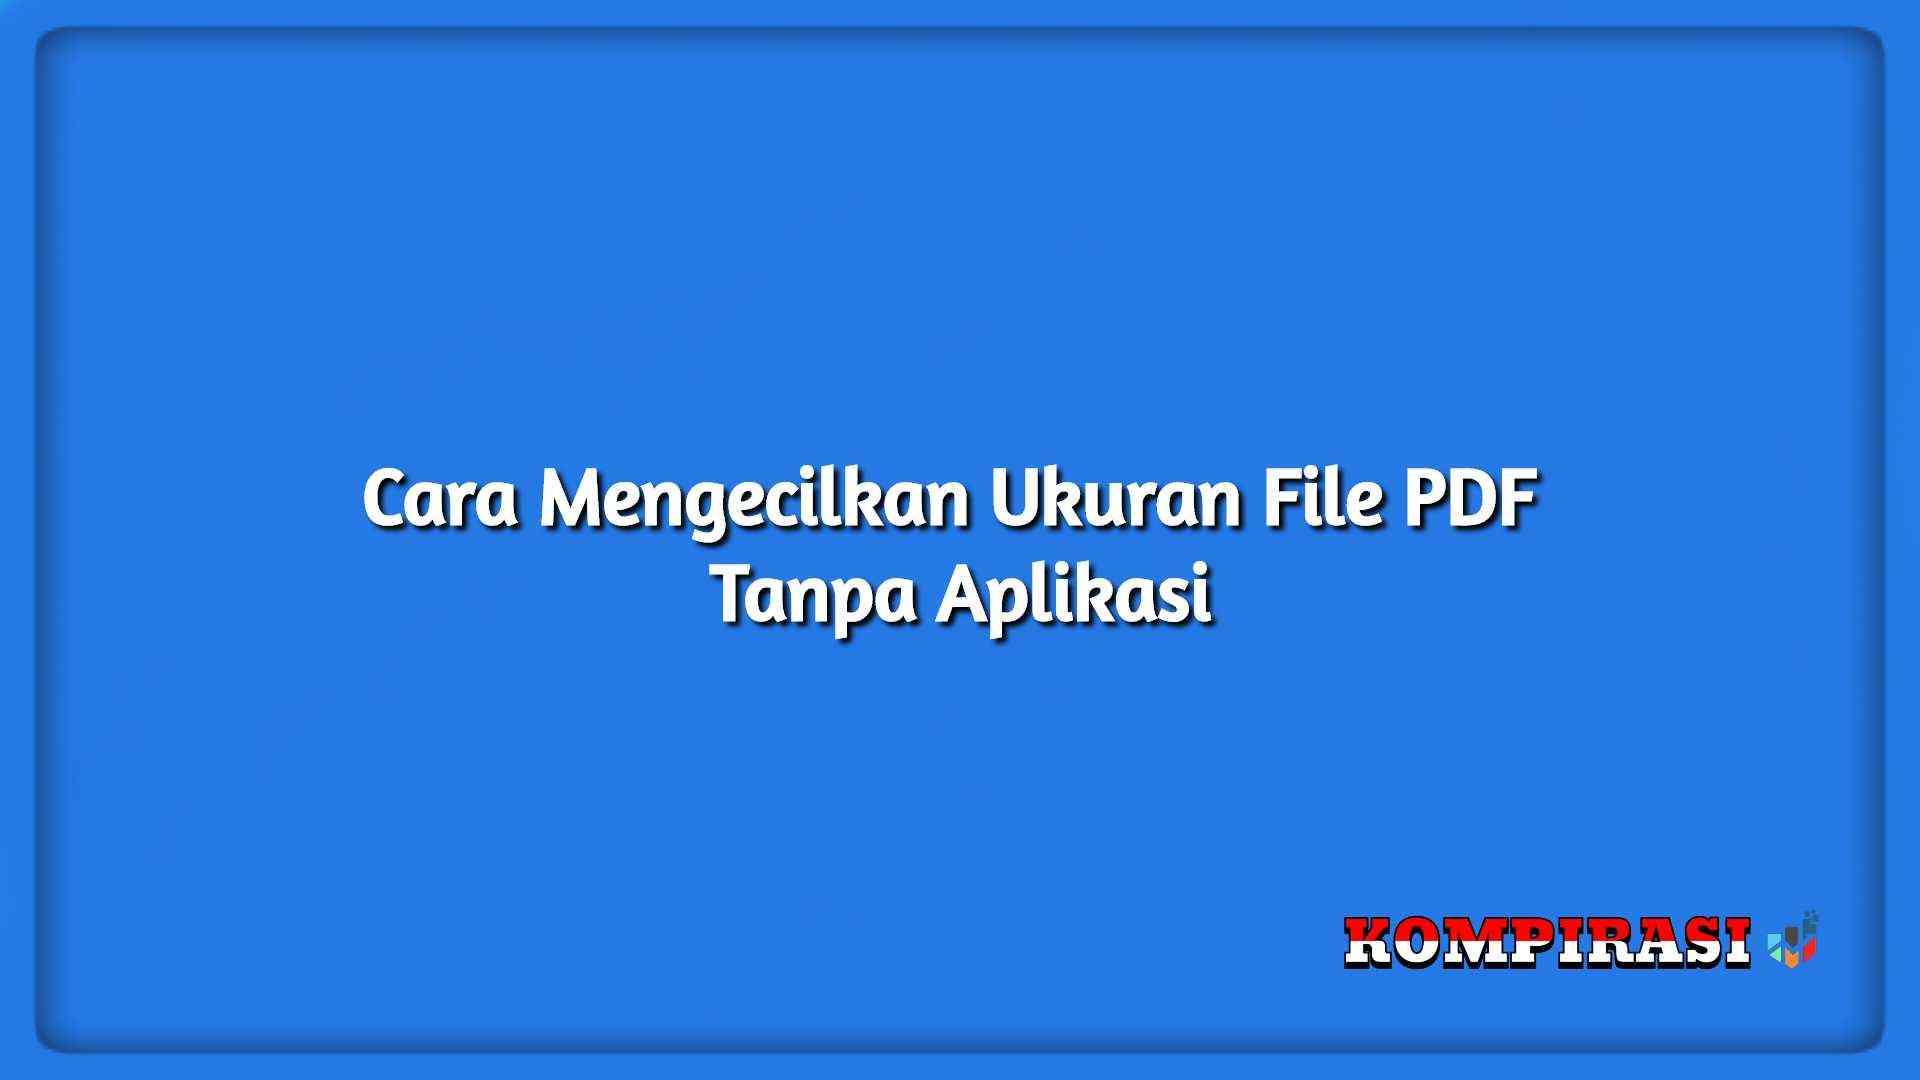 Cara Mengecilkan Ukuran File Pdf Tanpa Aplikasi Kompirasi